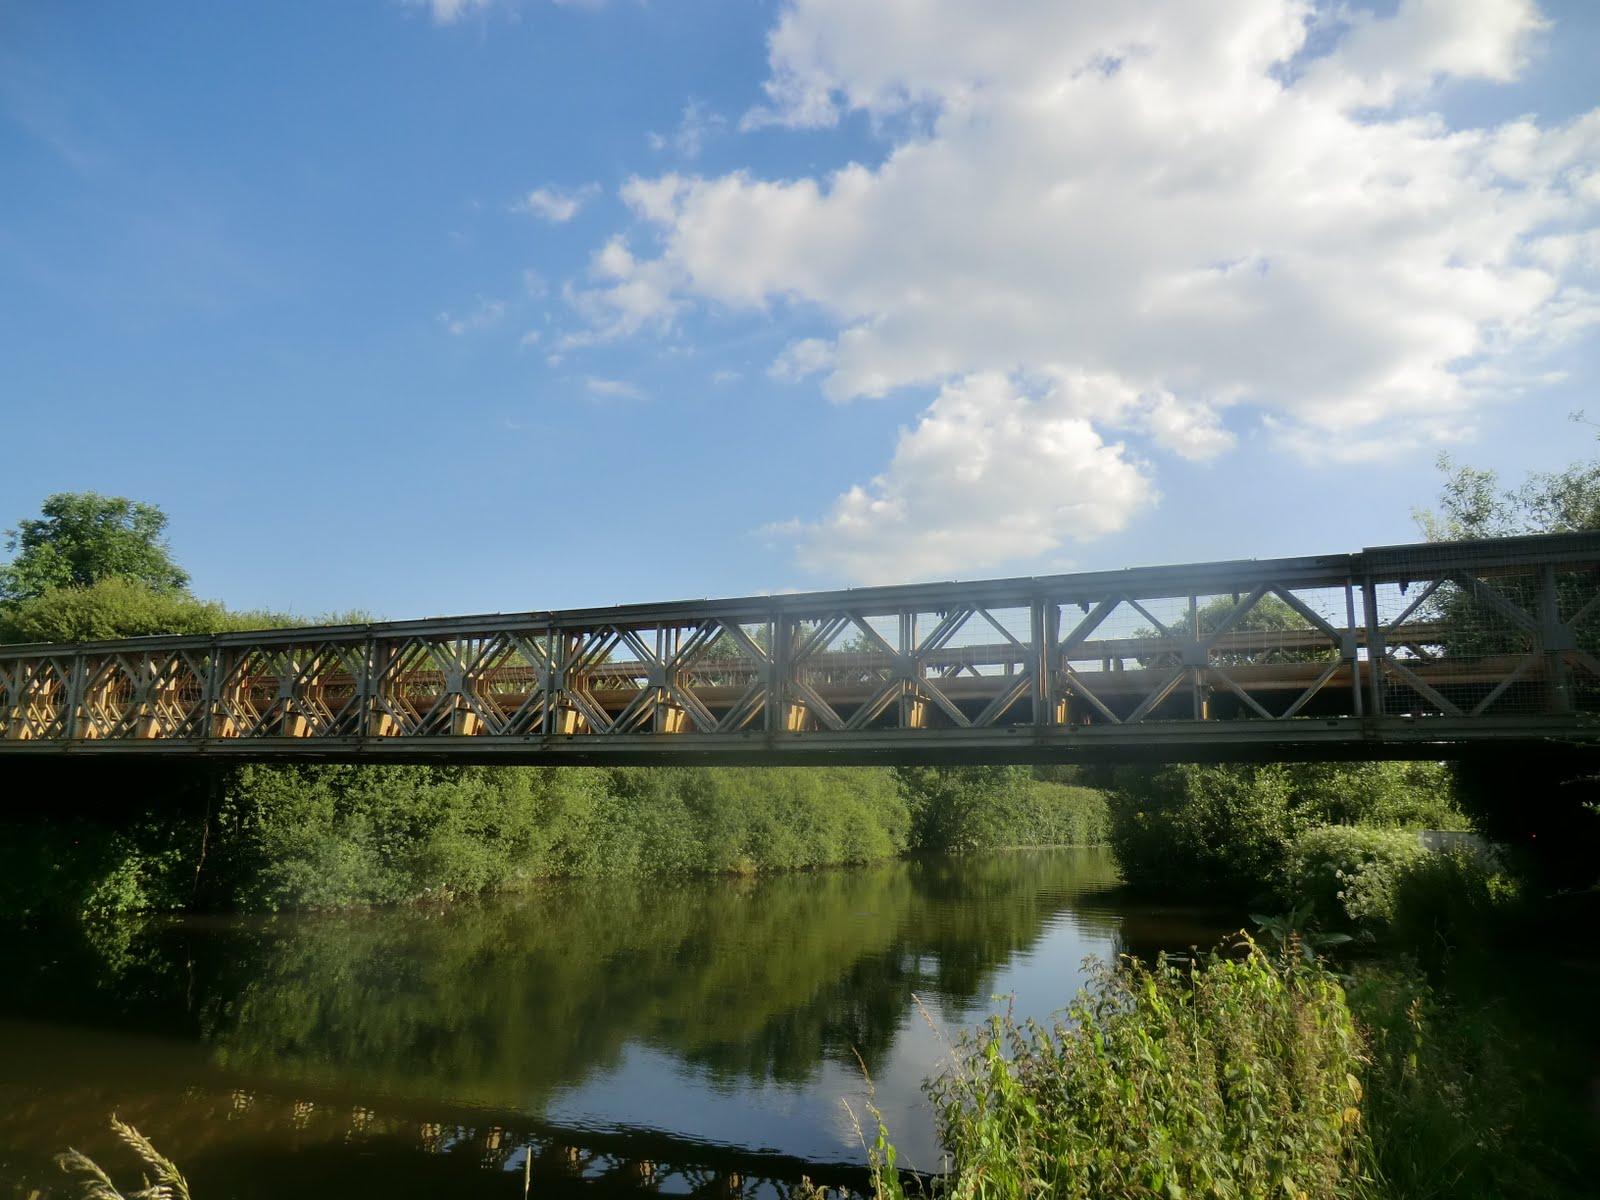 CIMG2013 River Medway